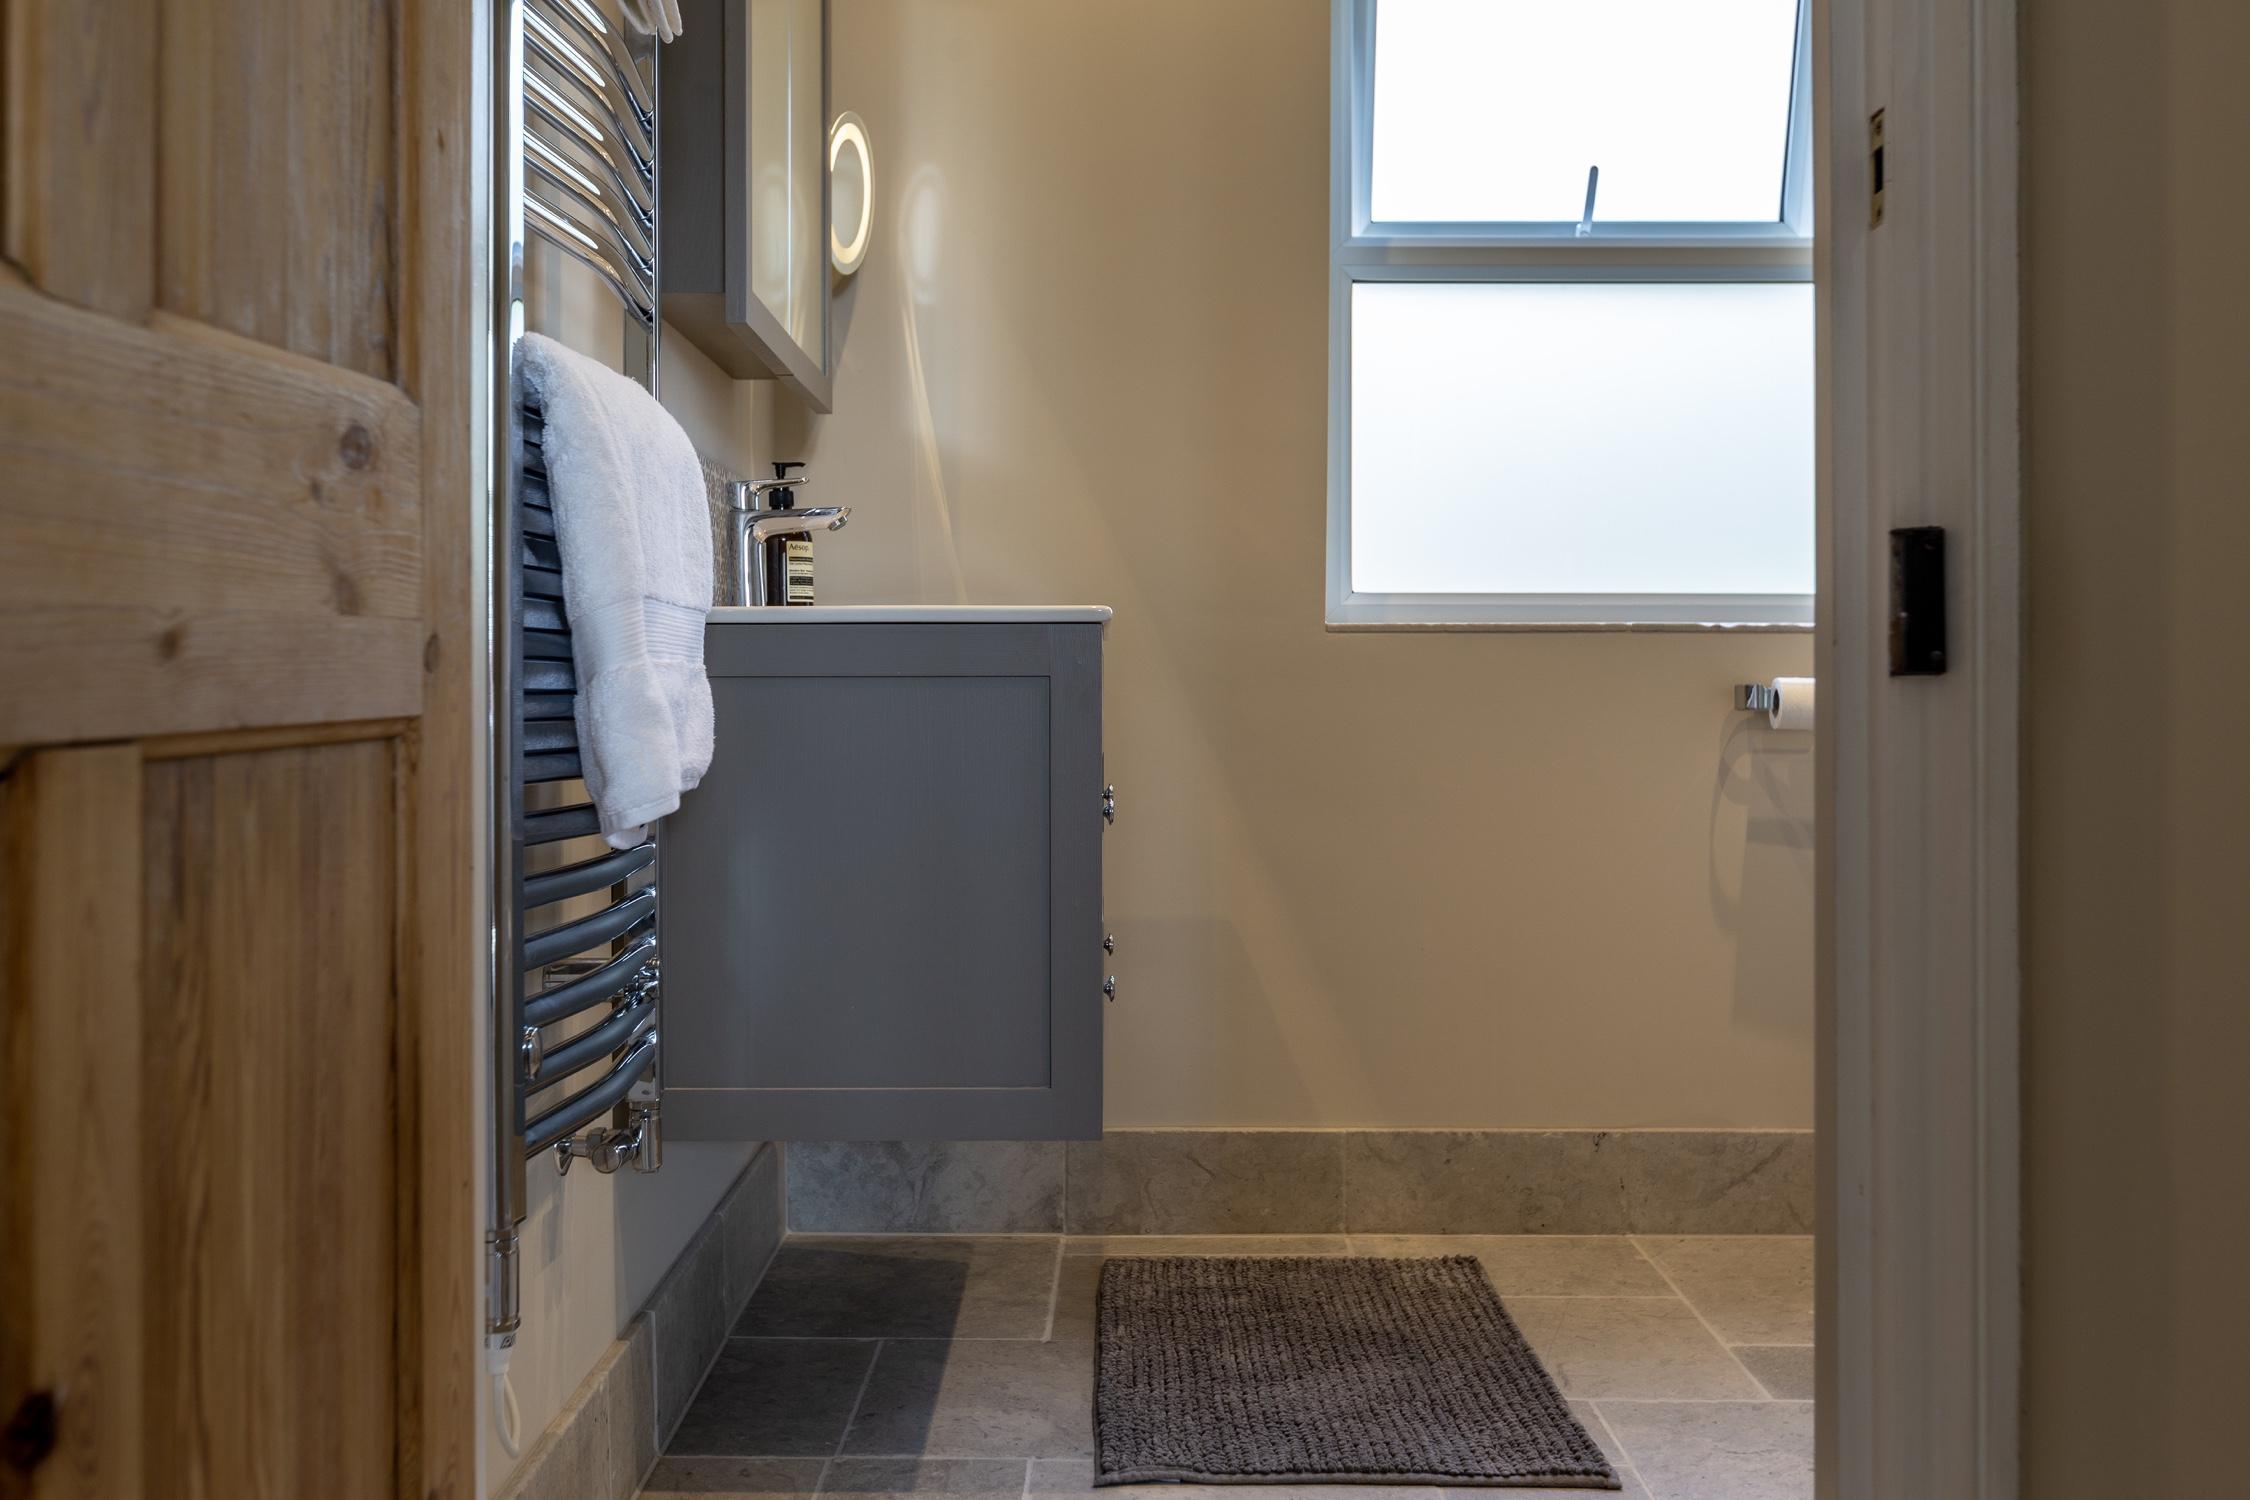 Sensational Rustic Wet Room Design Installation Jeremy Colson Download Free Architecture Designs Scobabritishbridgeorg